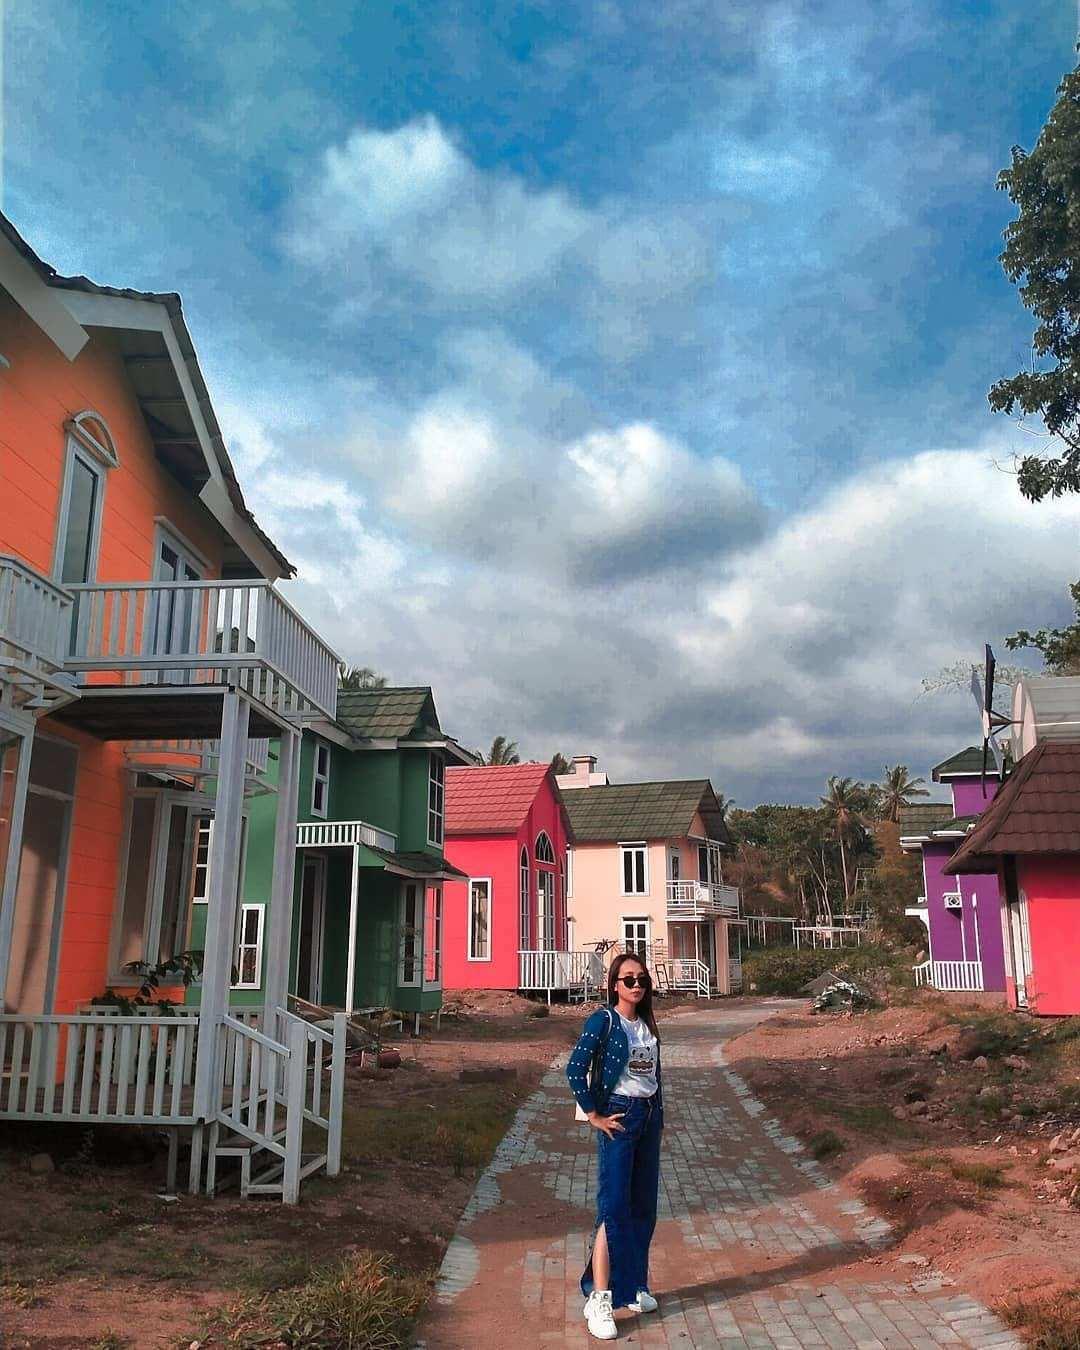 Rumah Warna Warni di Alamanda Jogja Flower Garden Image From @yesa_yesa